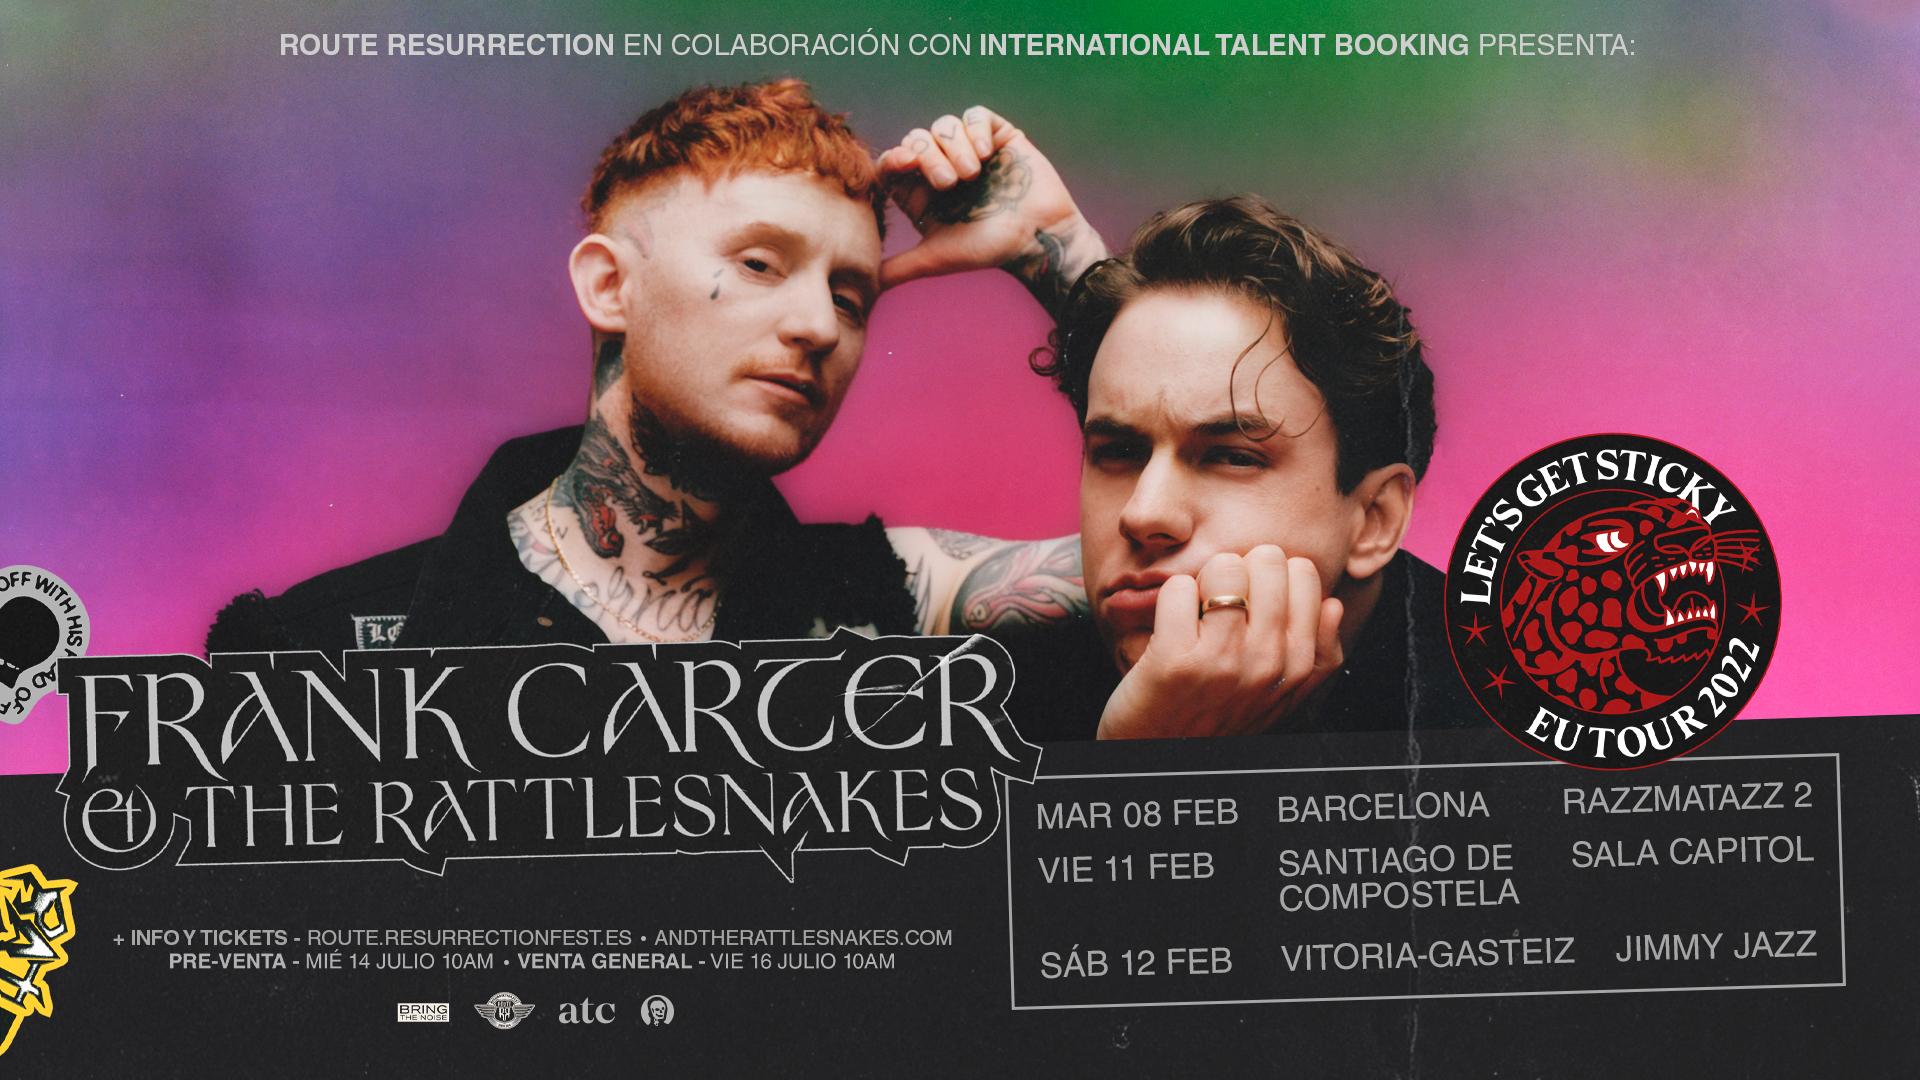 Route Resurrection Fest 2022 - Frank Carter And The Rattlesnakes